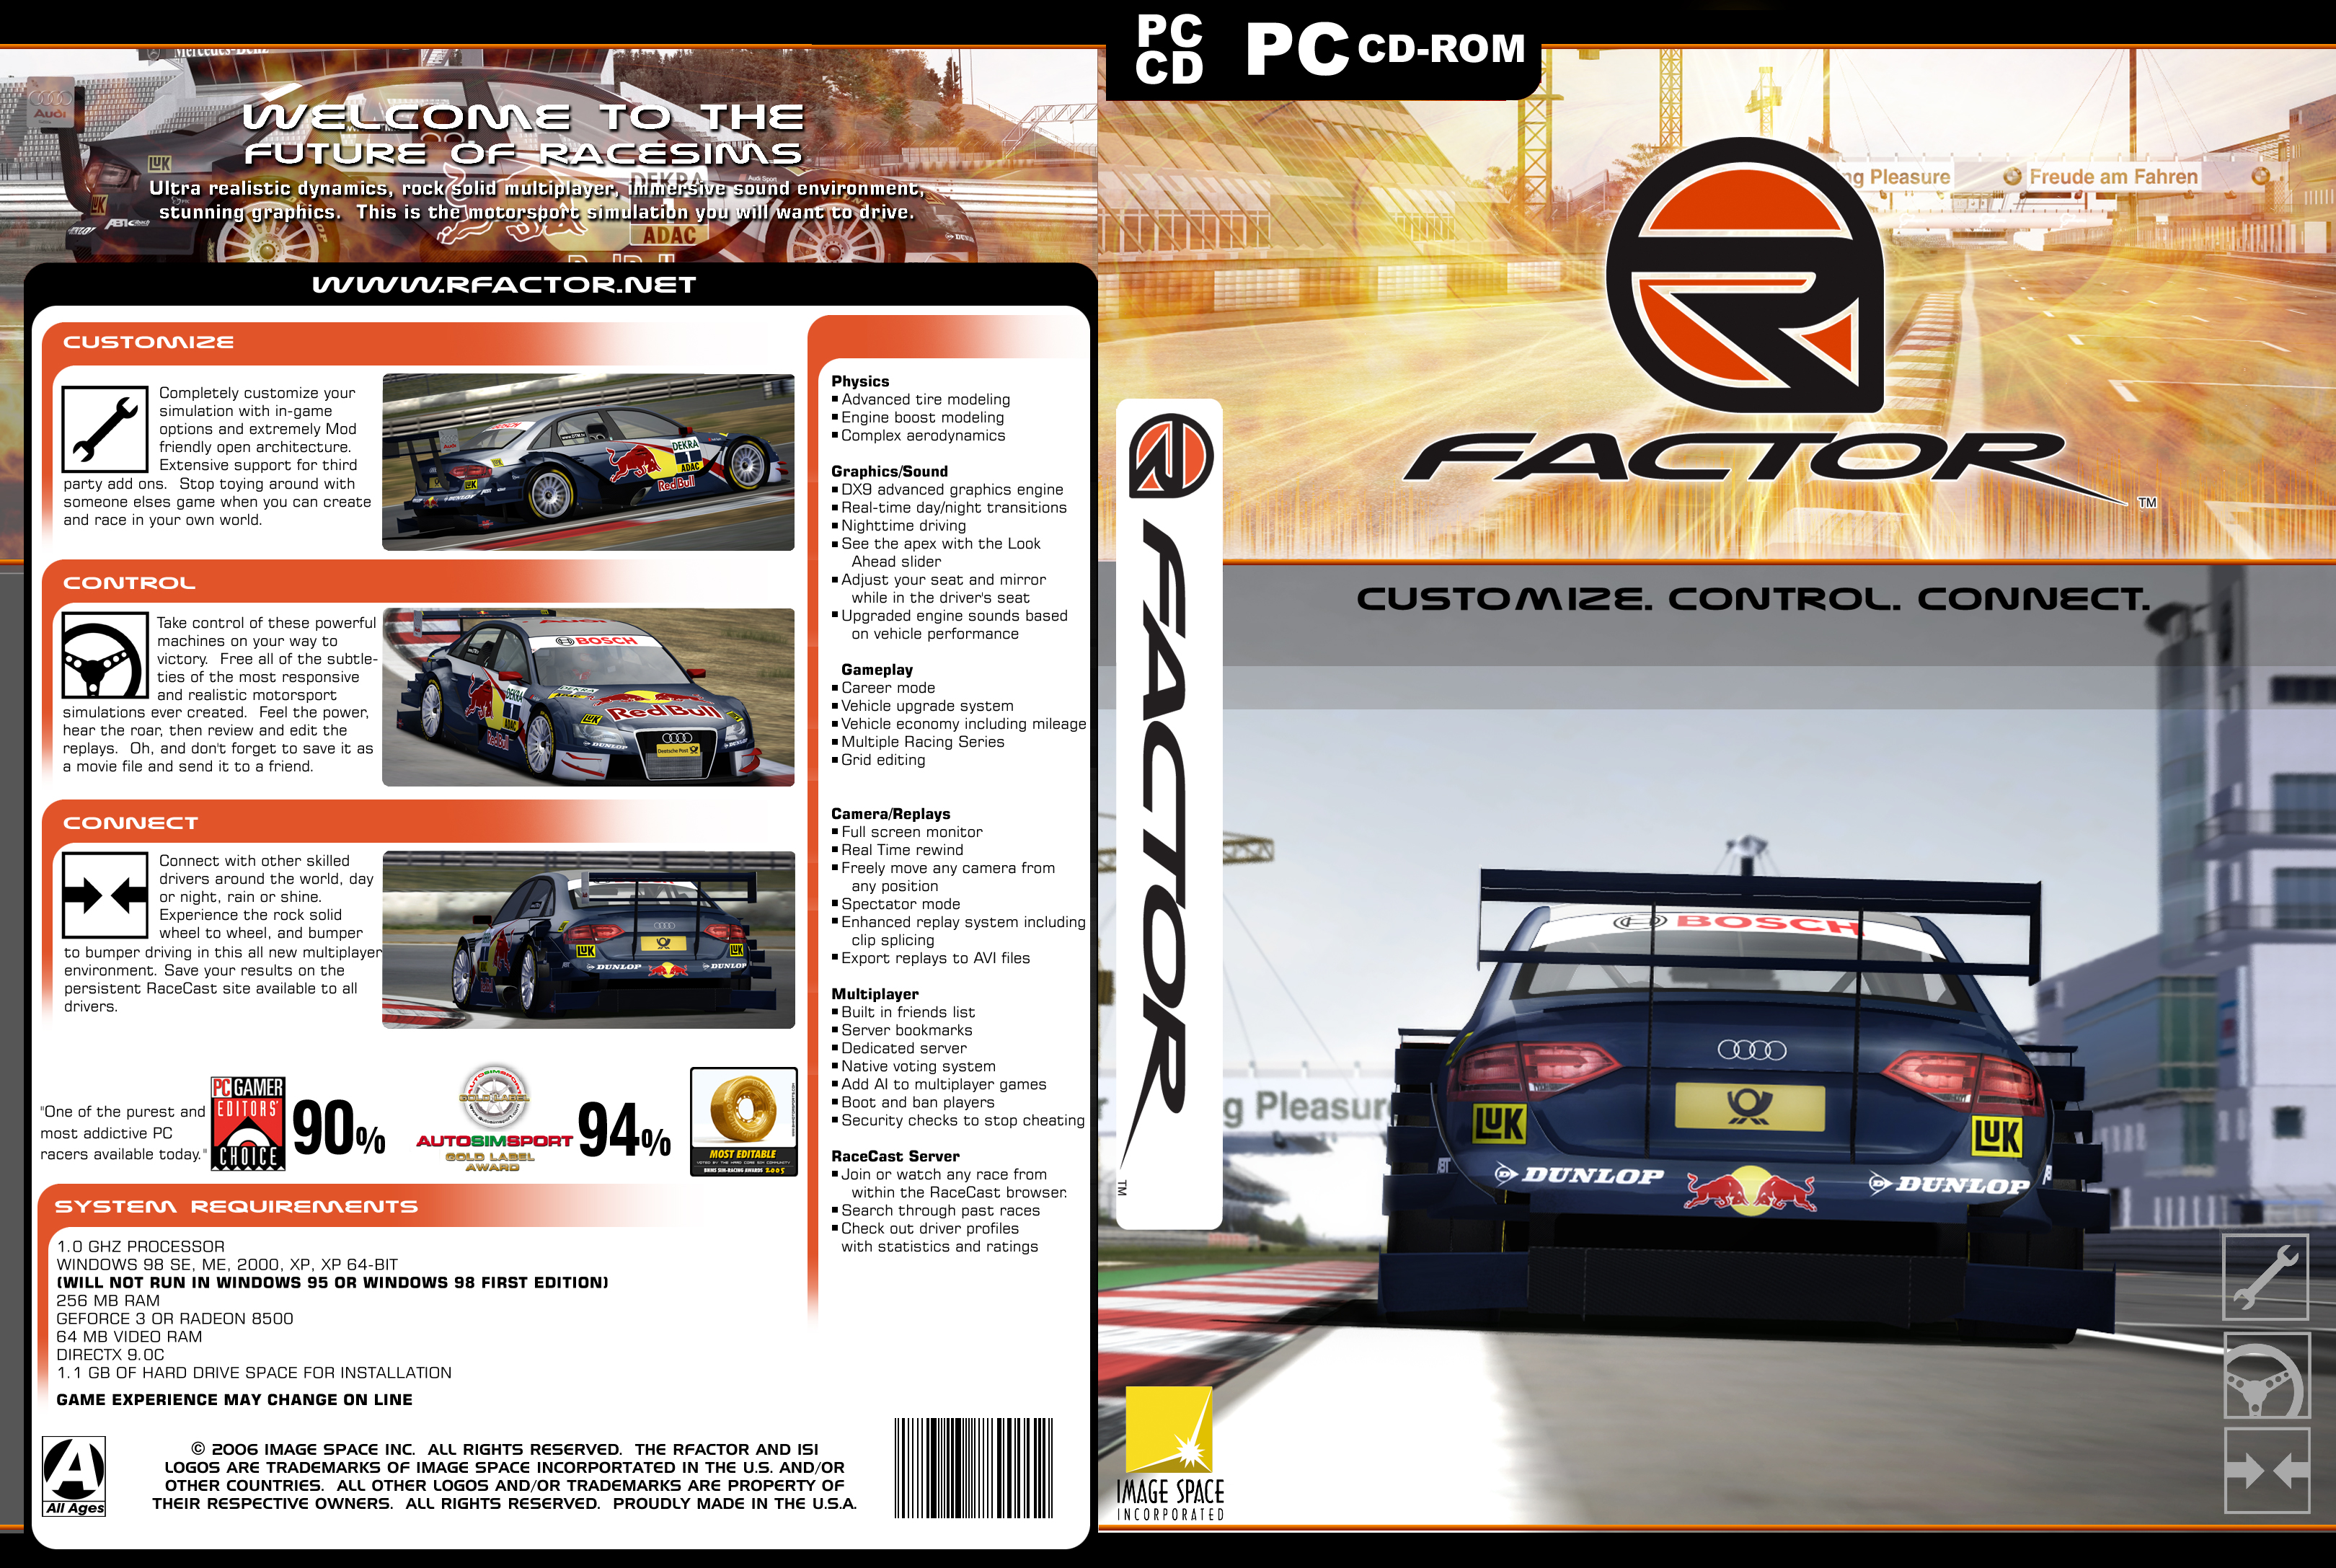 Alternate rfactor covers released sim for R factor windows